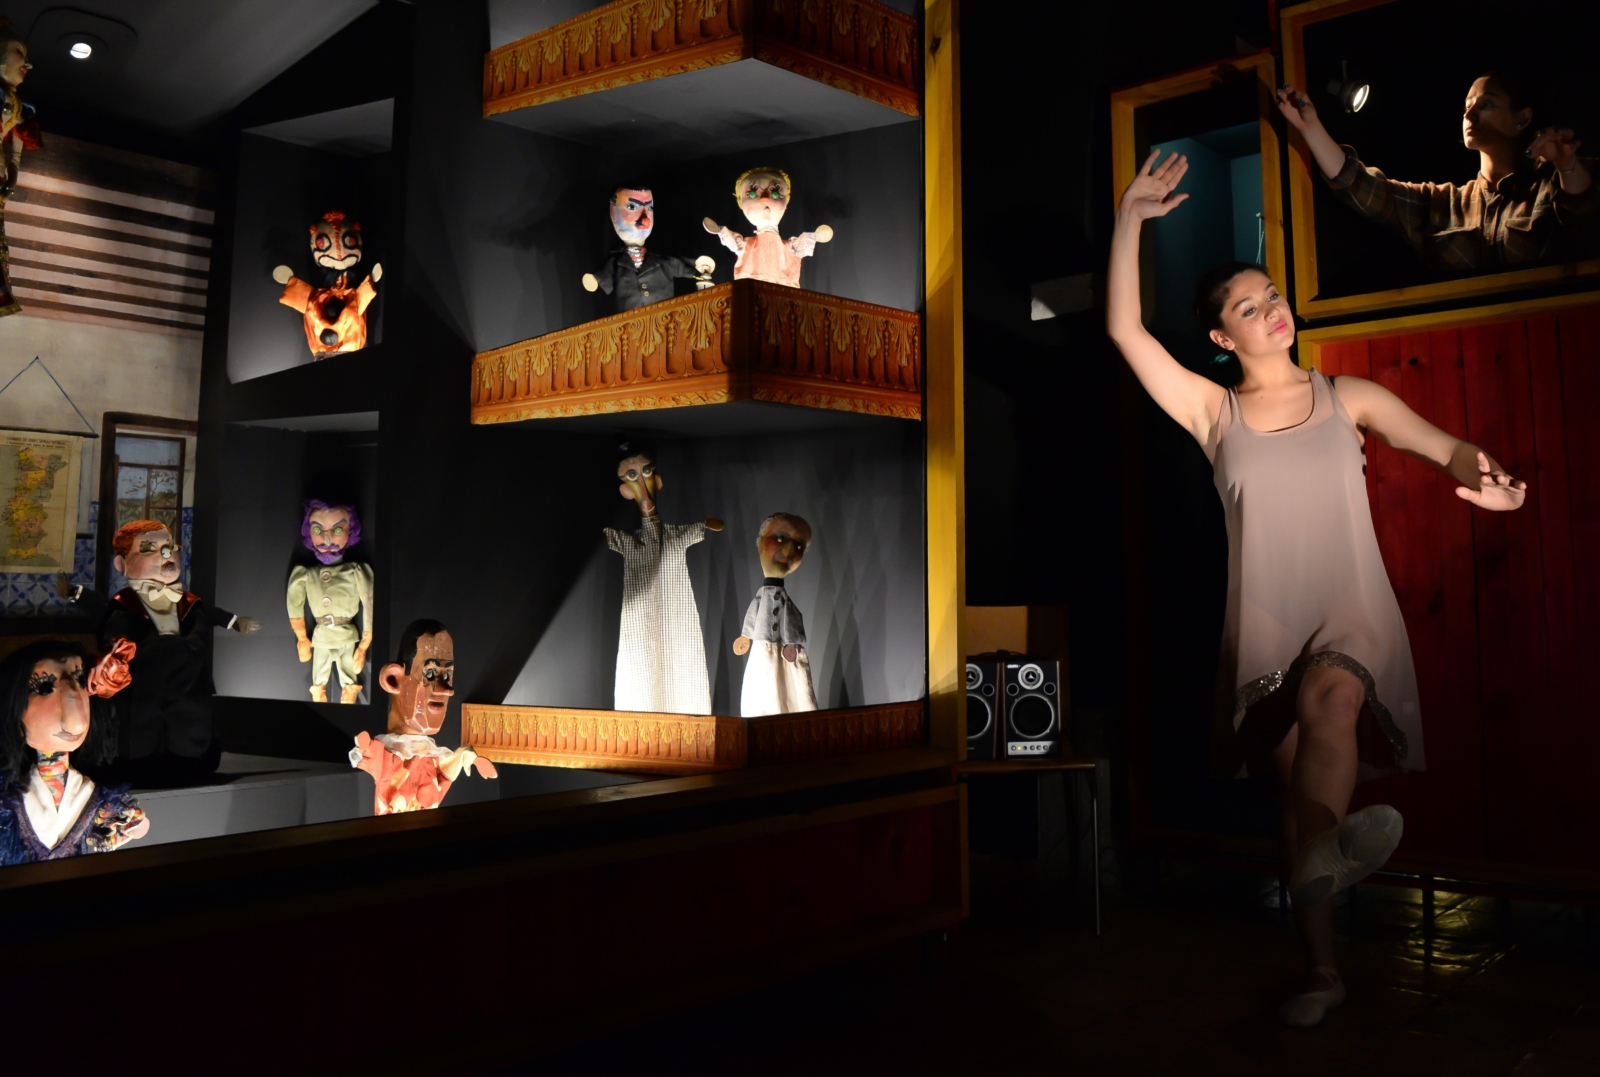 Bailarina no Museu da Marioneta